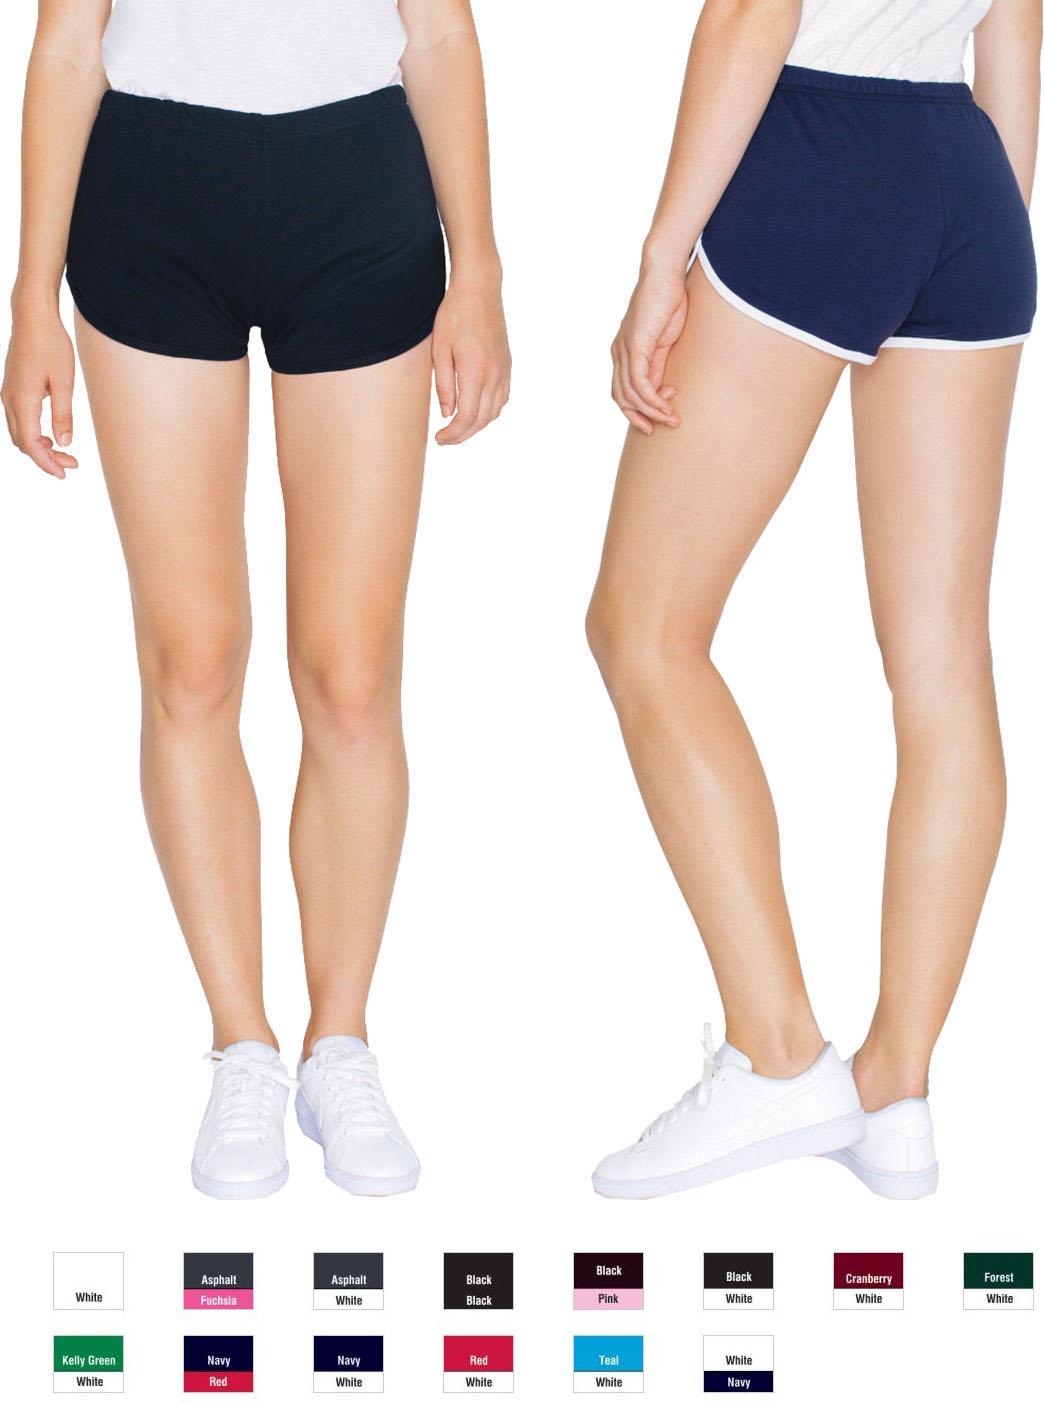 American Apparel INTERLOCK RUNNING SHORTS Girls Women/'s Yoga Running 7301W NEW